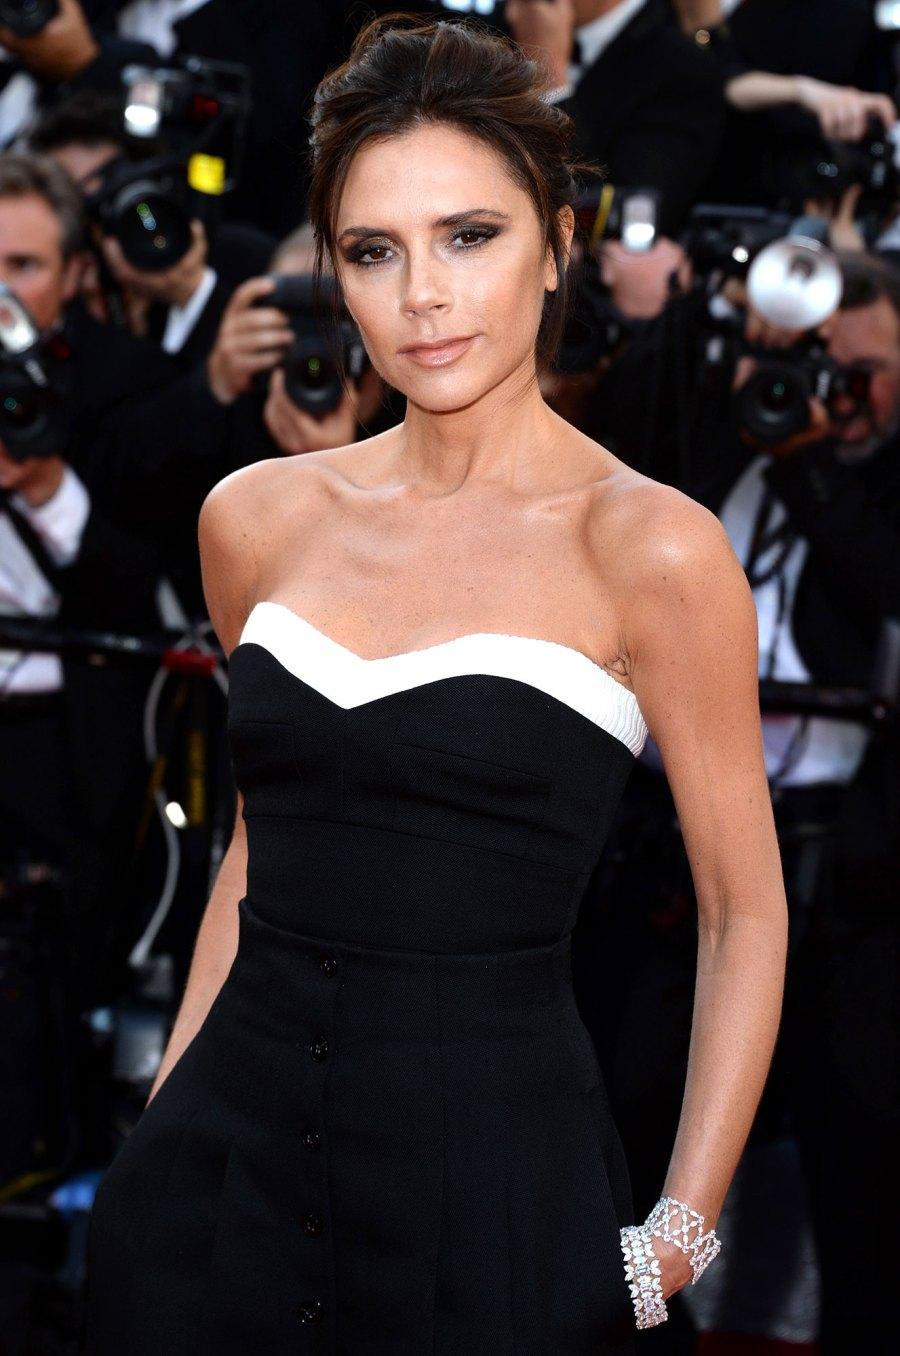 Victoria Beckham Celebrities Share PCOS Struggles